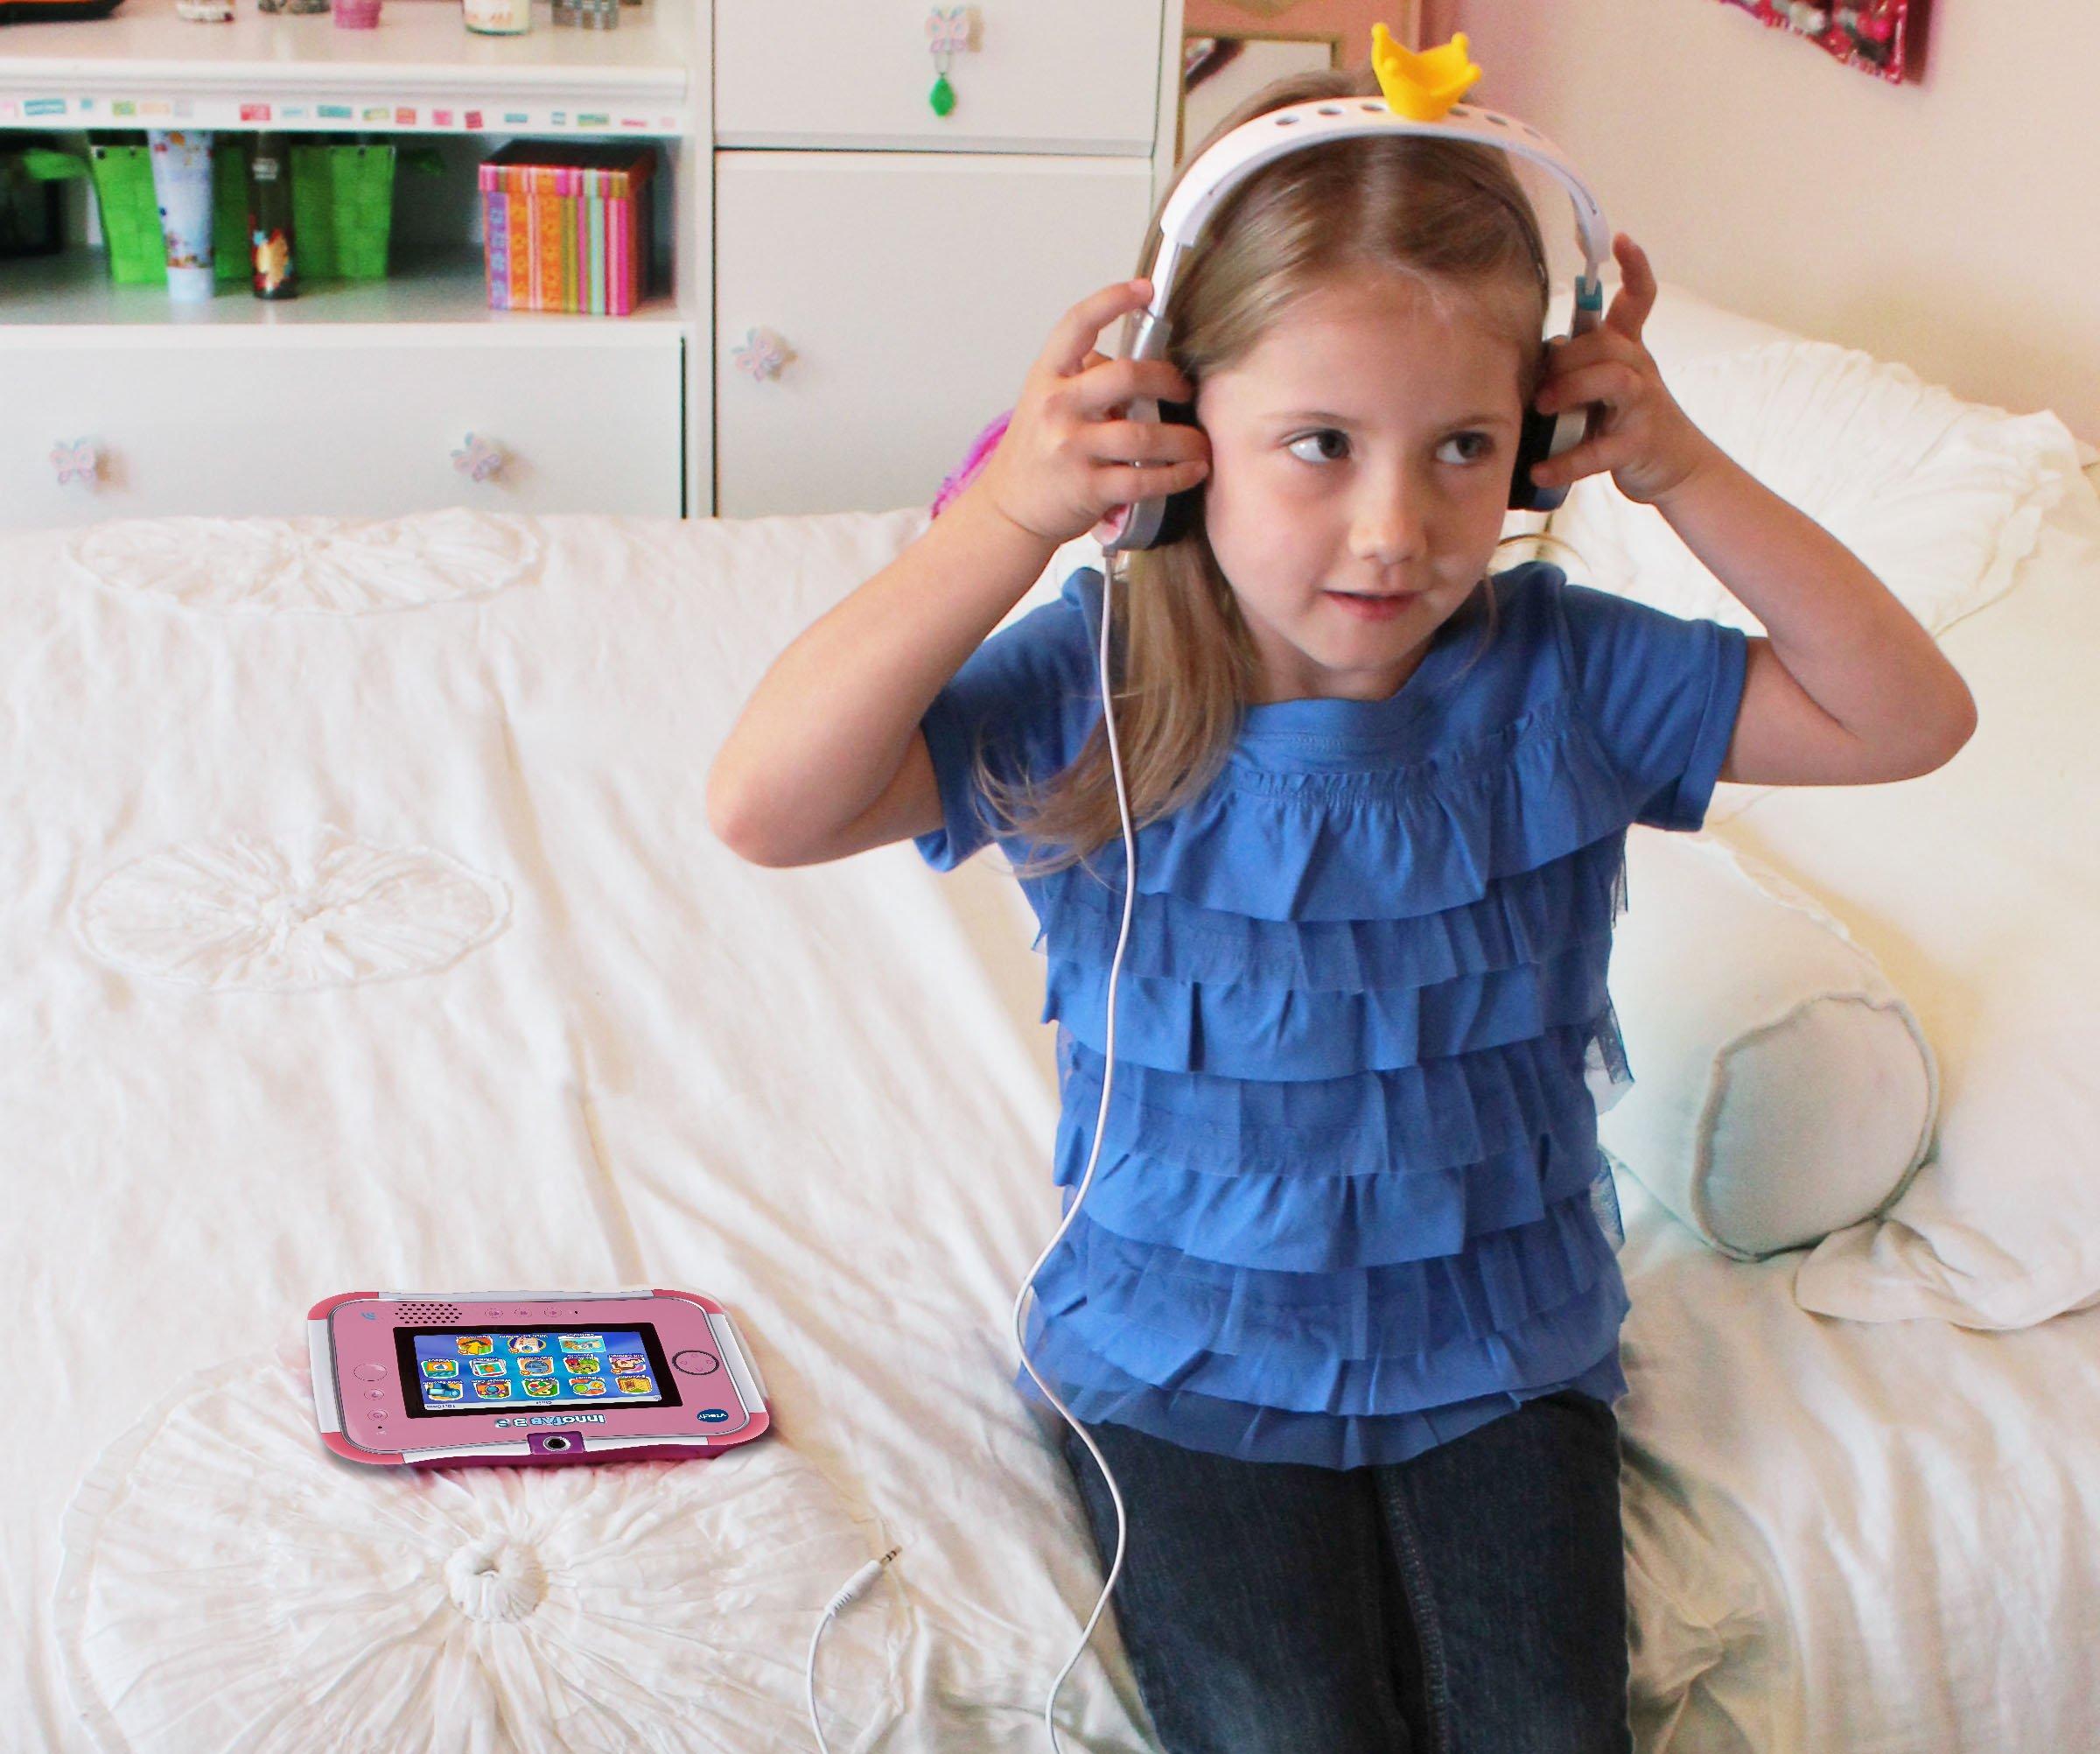 VTech InnoTab 3S Kids Tablet, Pink by VTech (Image #4)